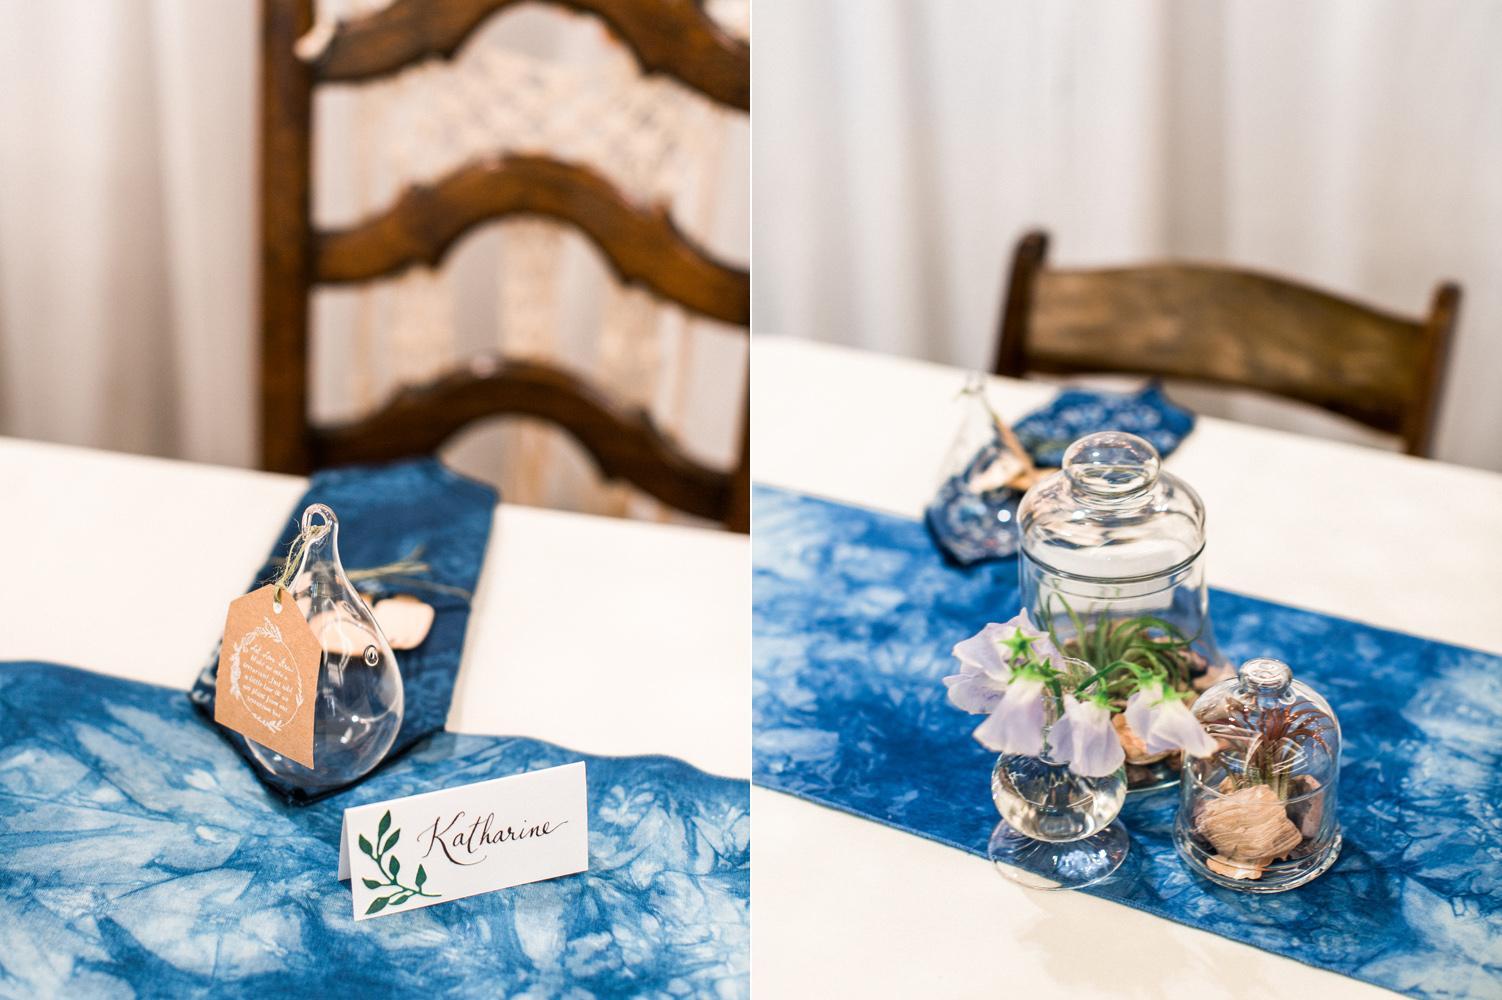 seattle center for urbanhorticulture diy wedding details.jpg